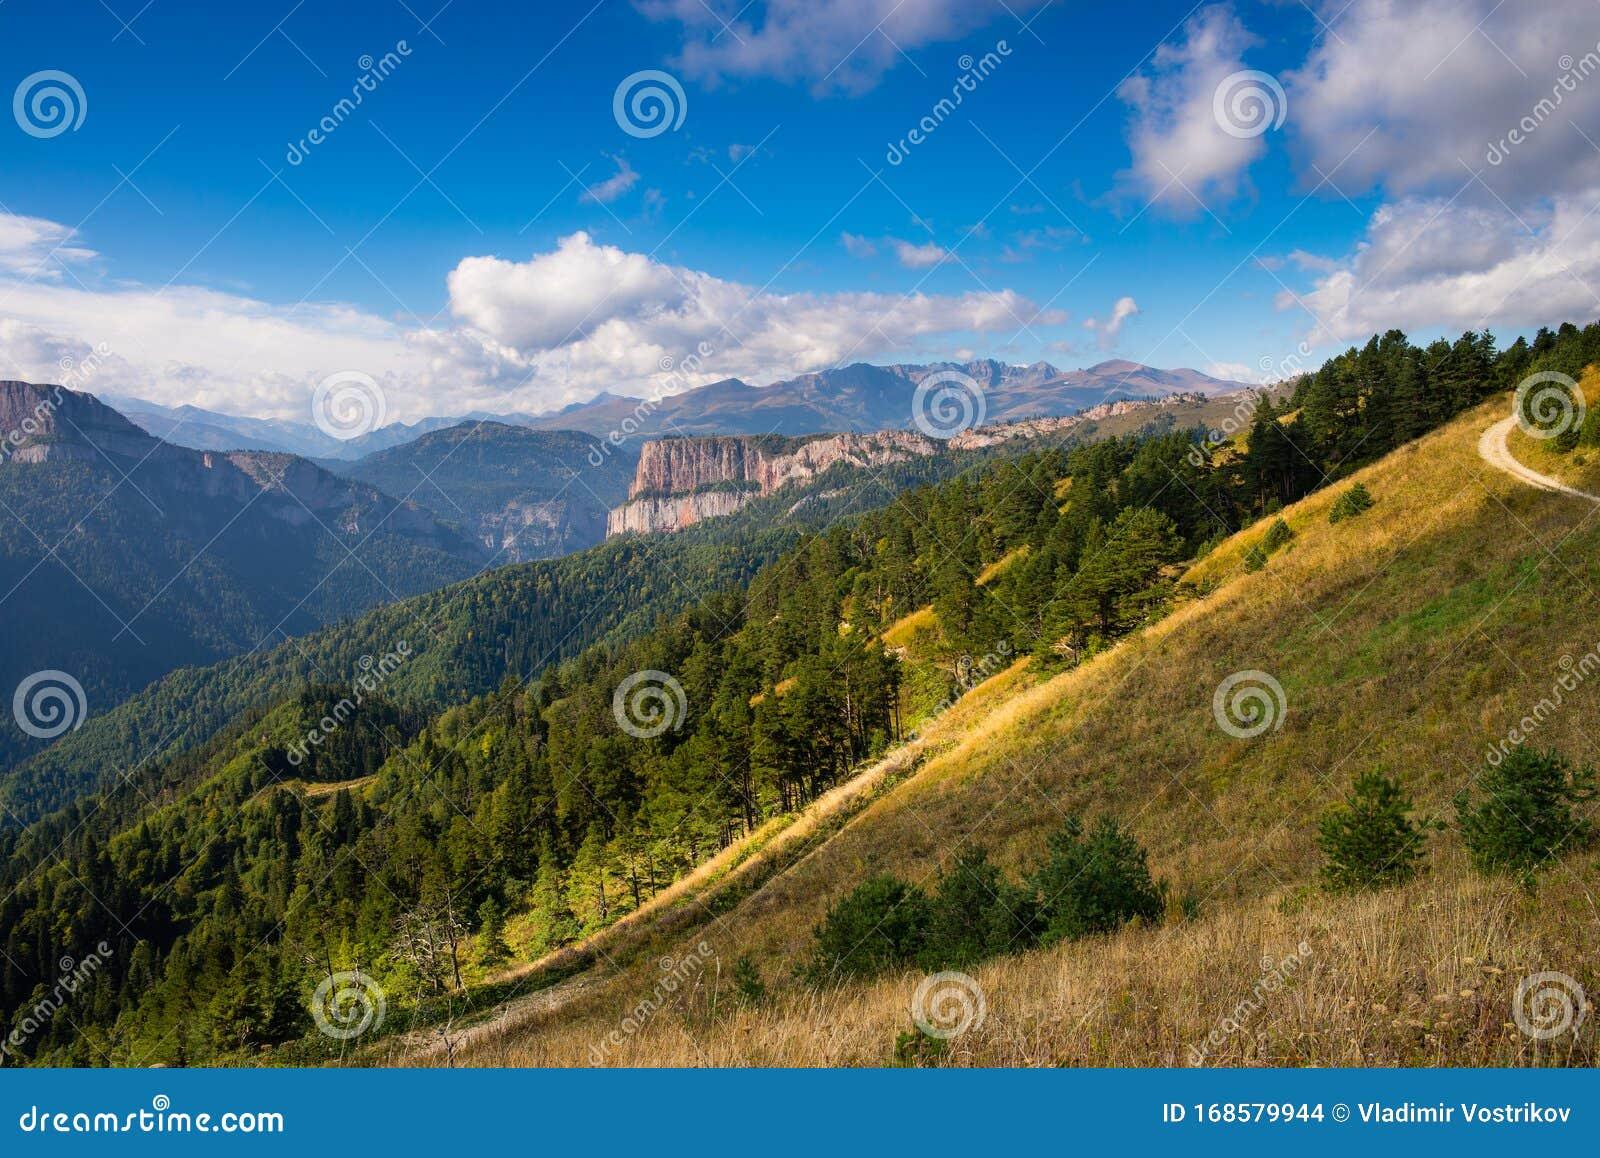 Caucasian Mountains Of The Republic Of Adygea, Krasnodar Region ...